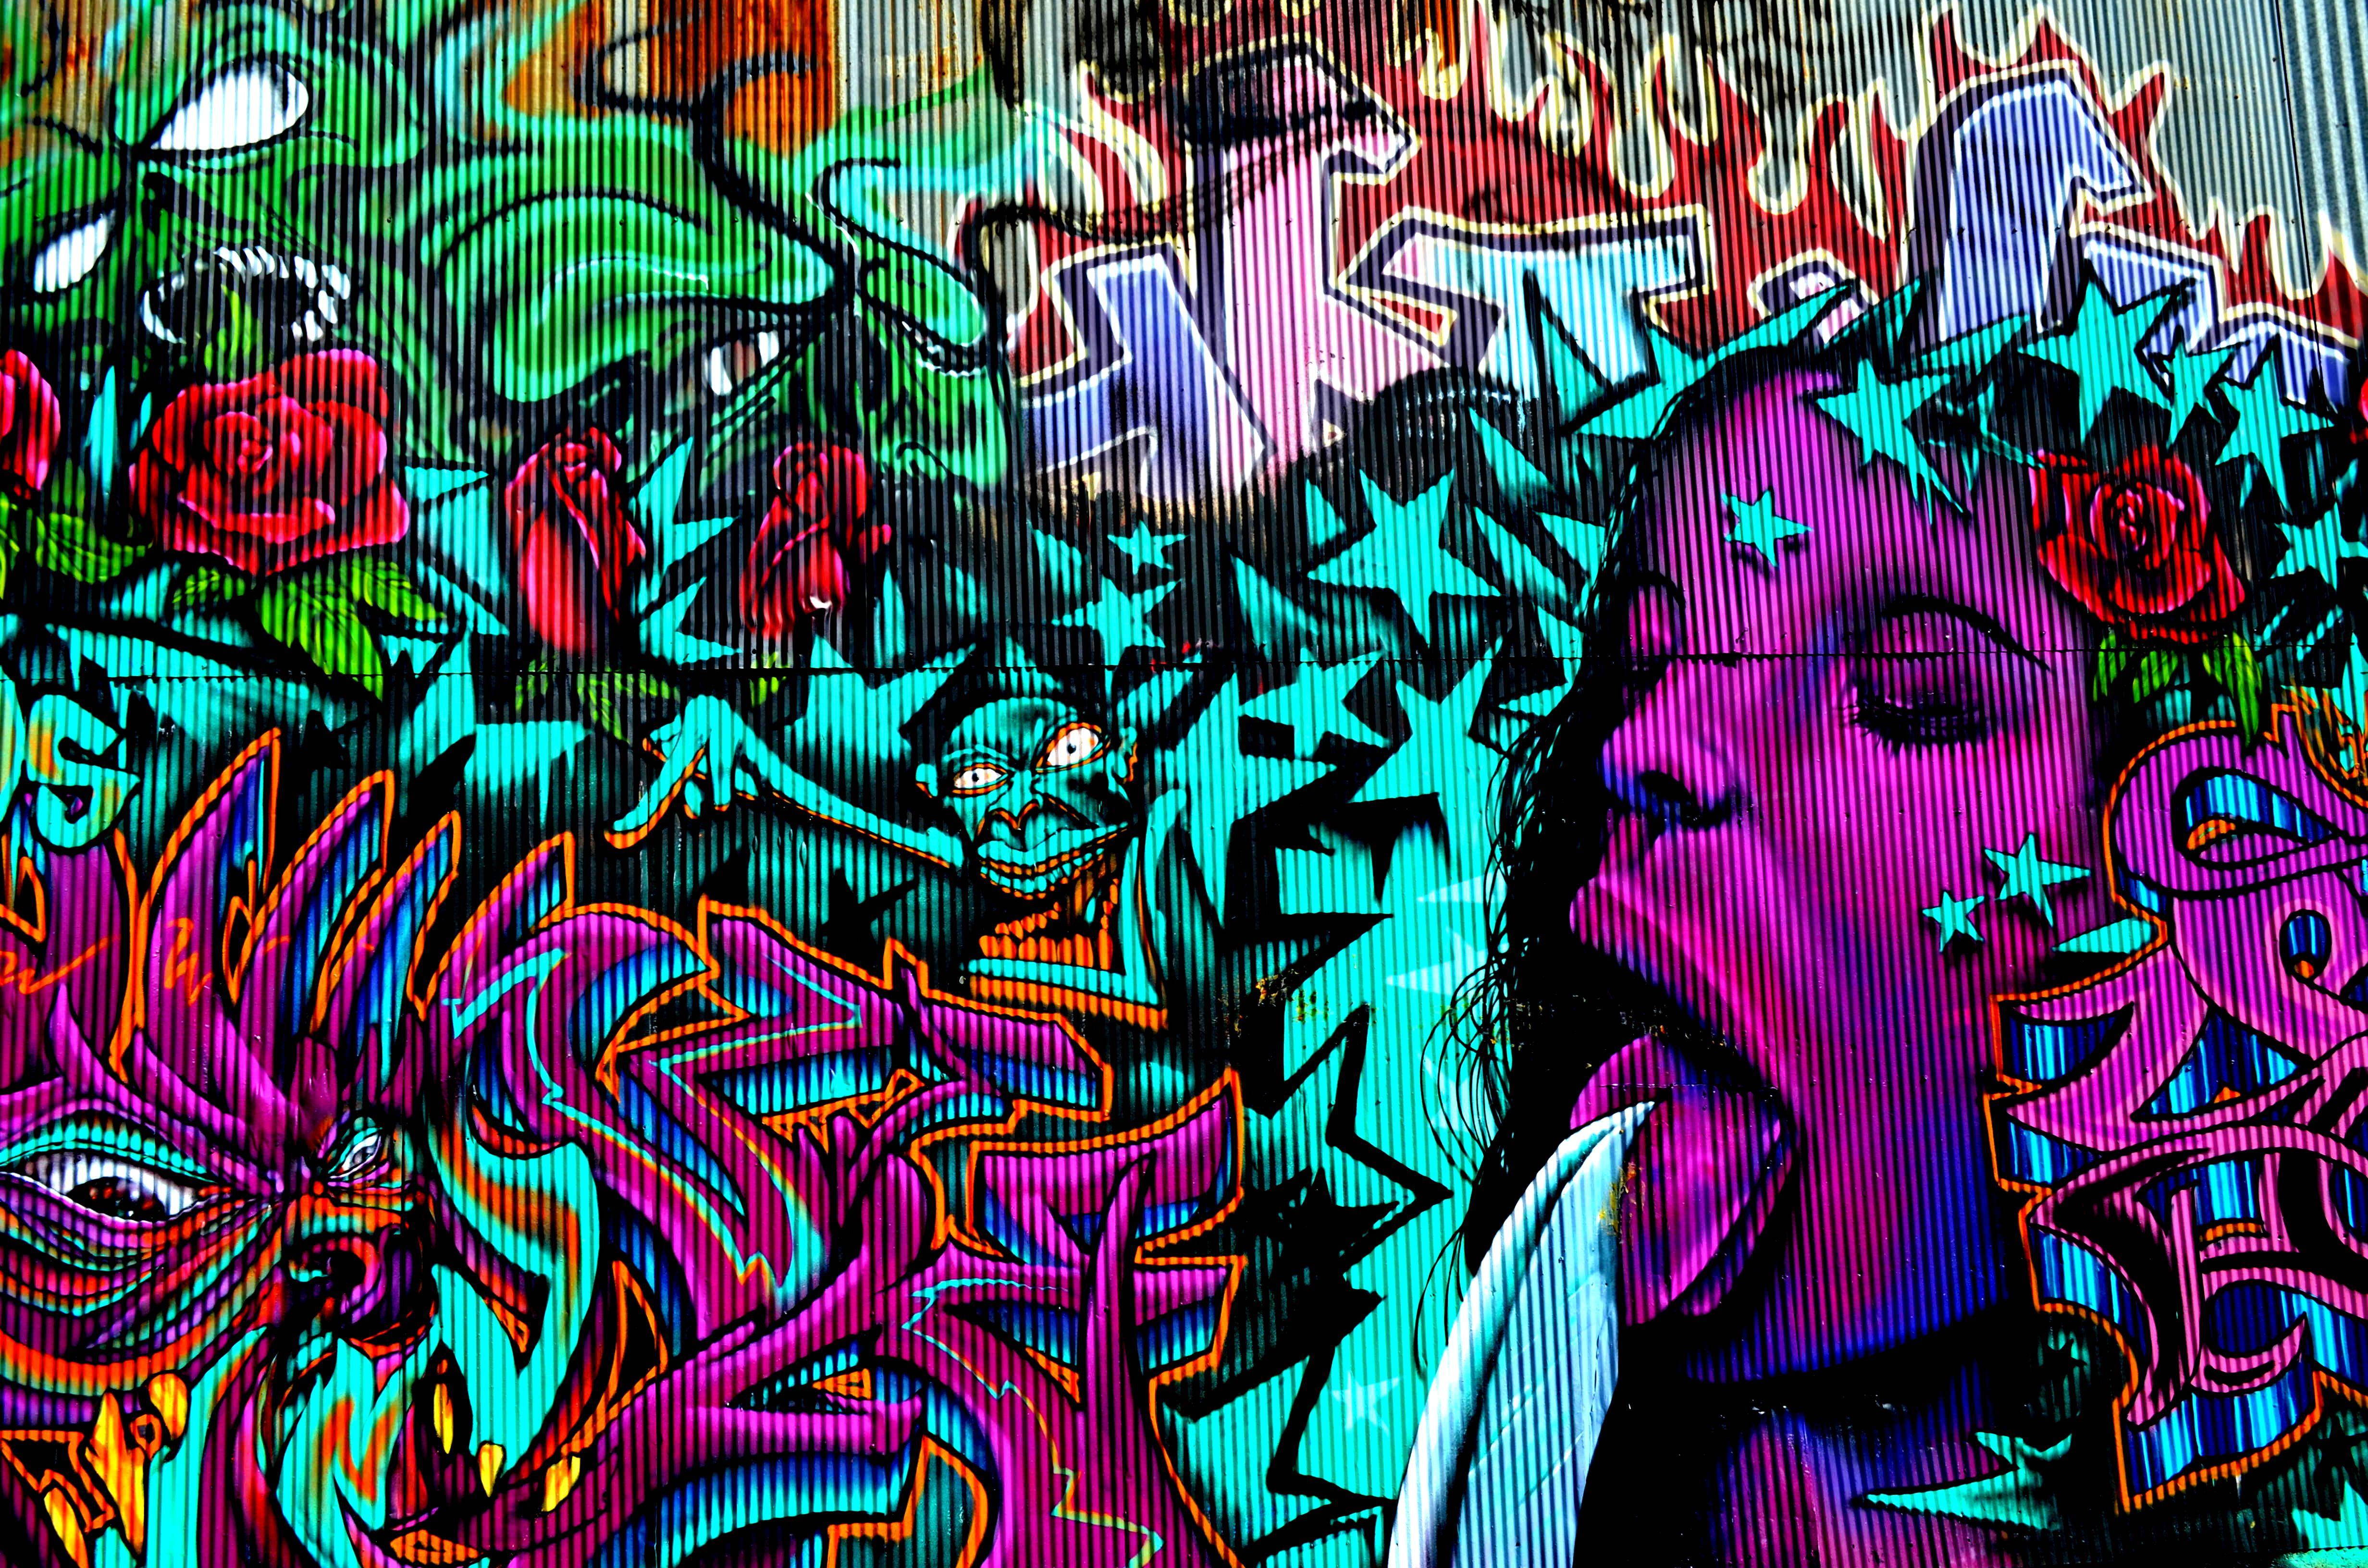 Android Wallpaper Graffiti Graffiti wallpaper, Graffiti